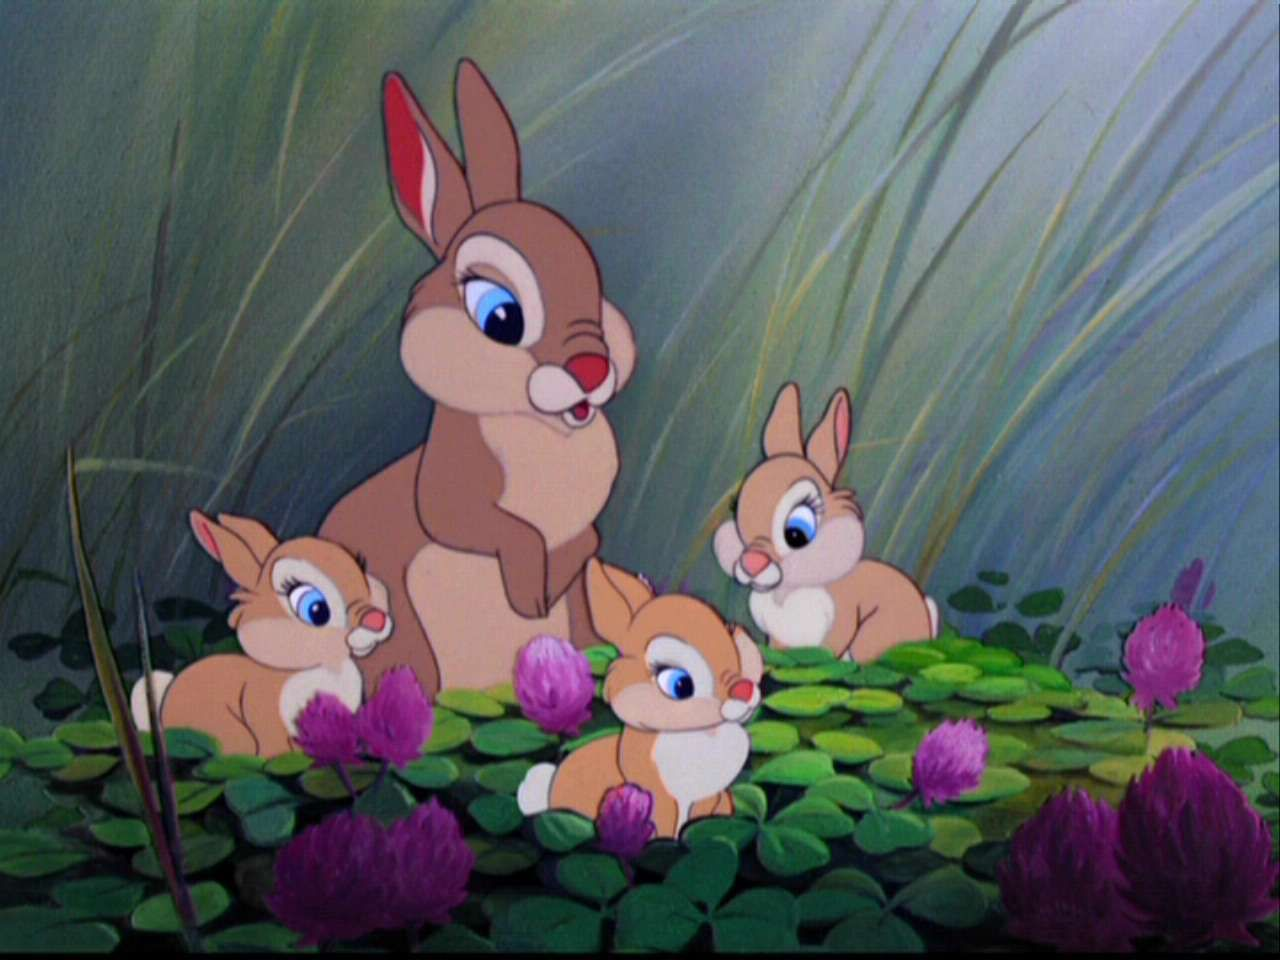 Bambi Friend Owl | Bambi - Bambi Image (5778321) - Fanpop